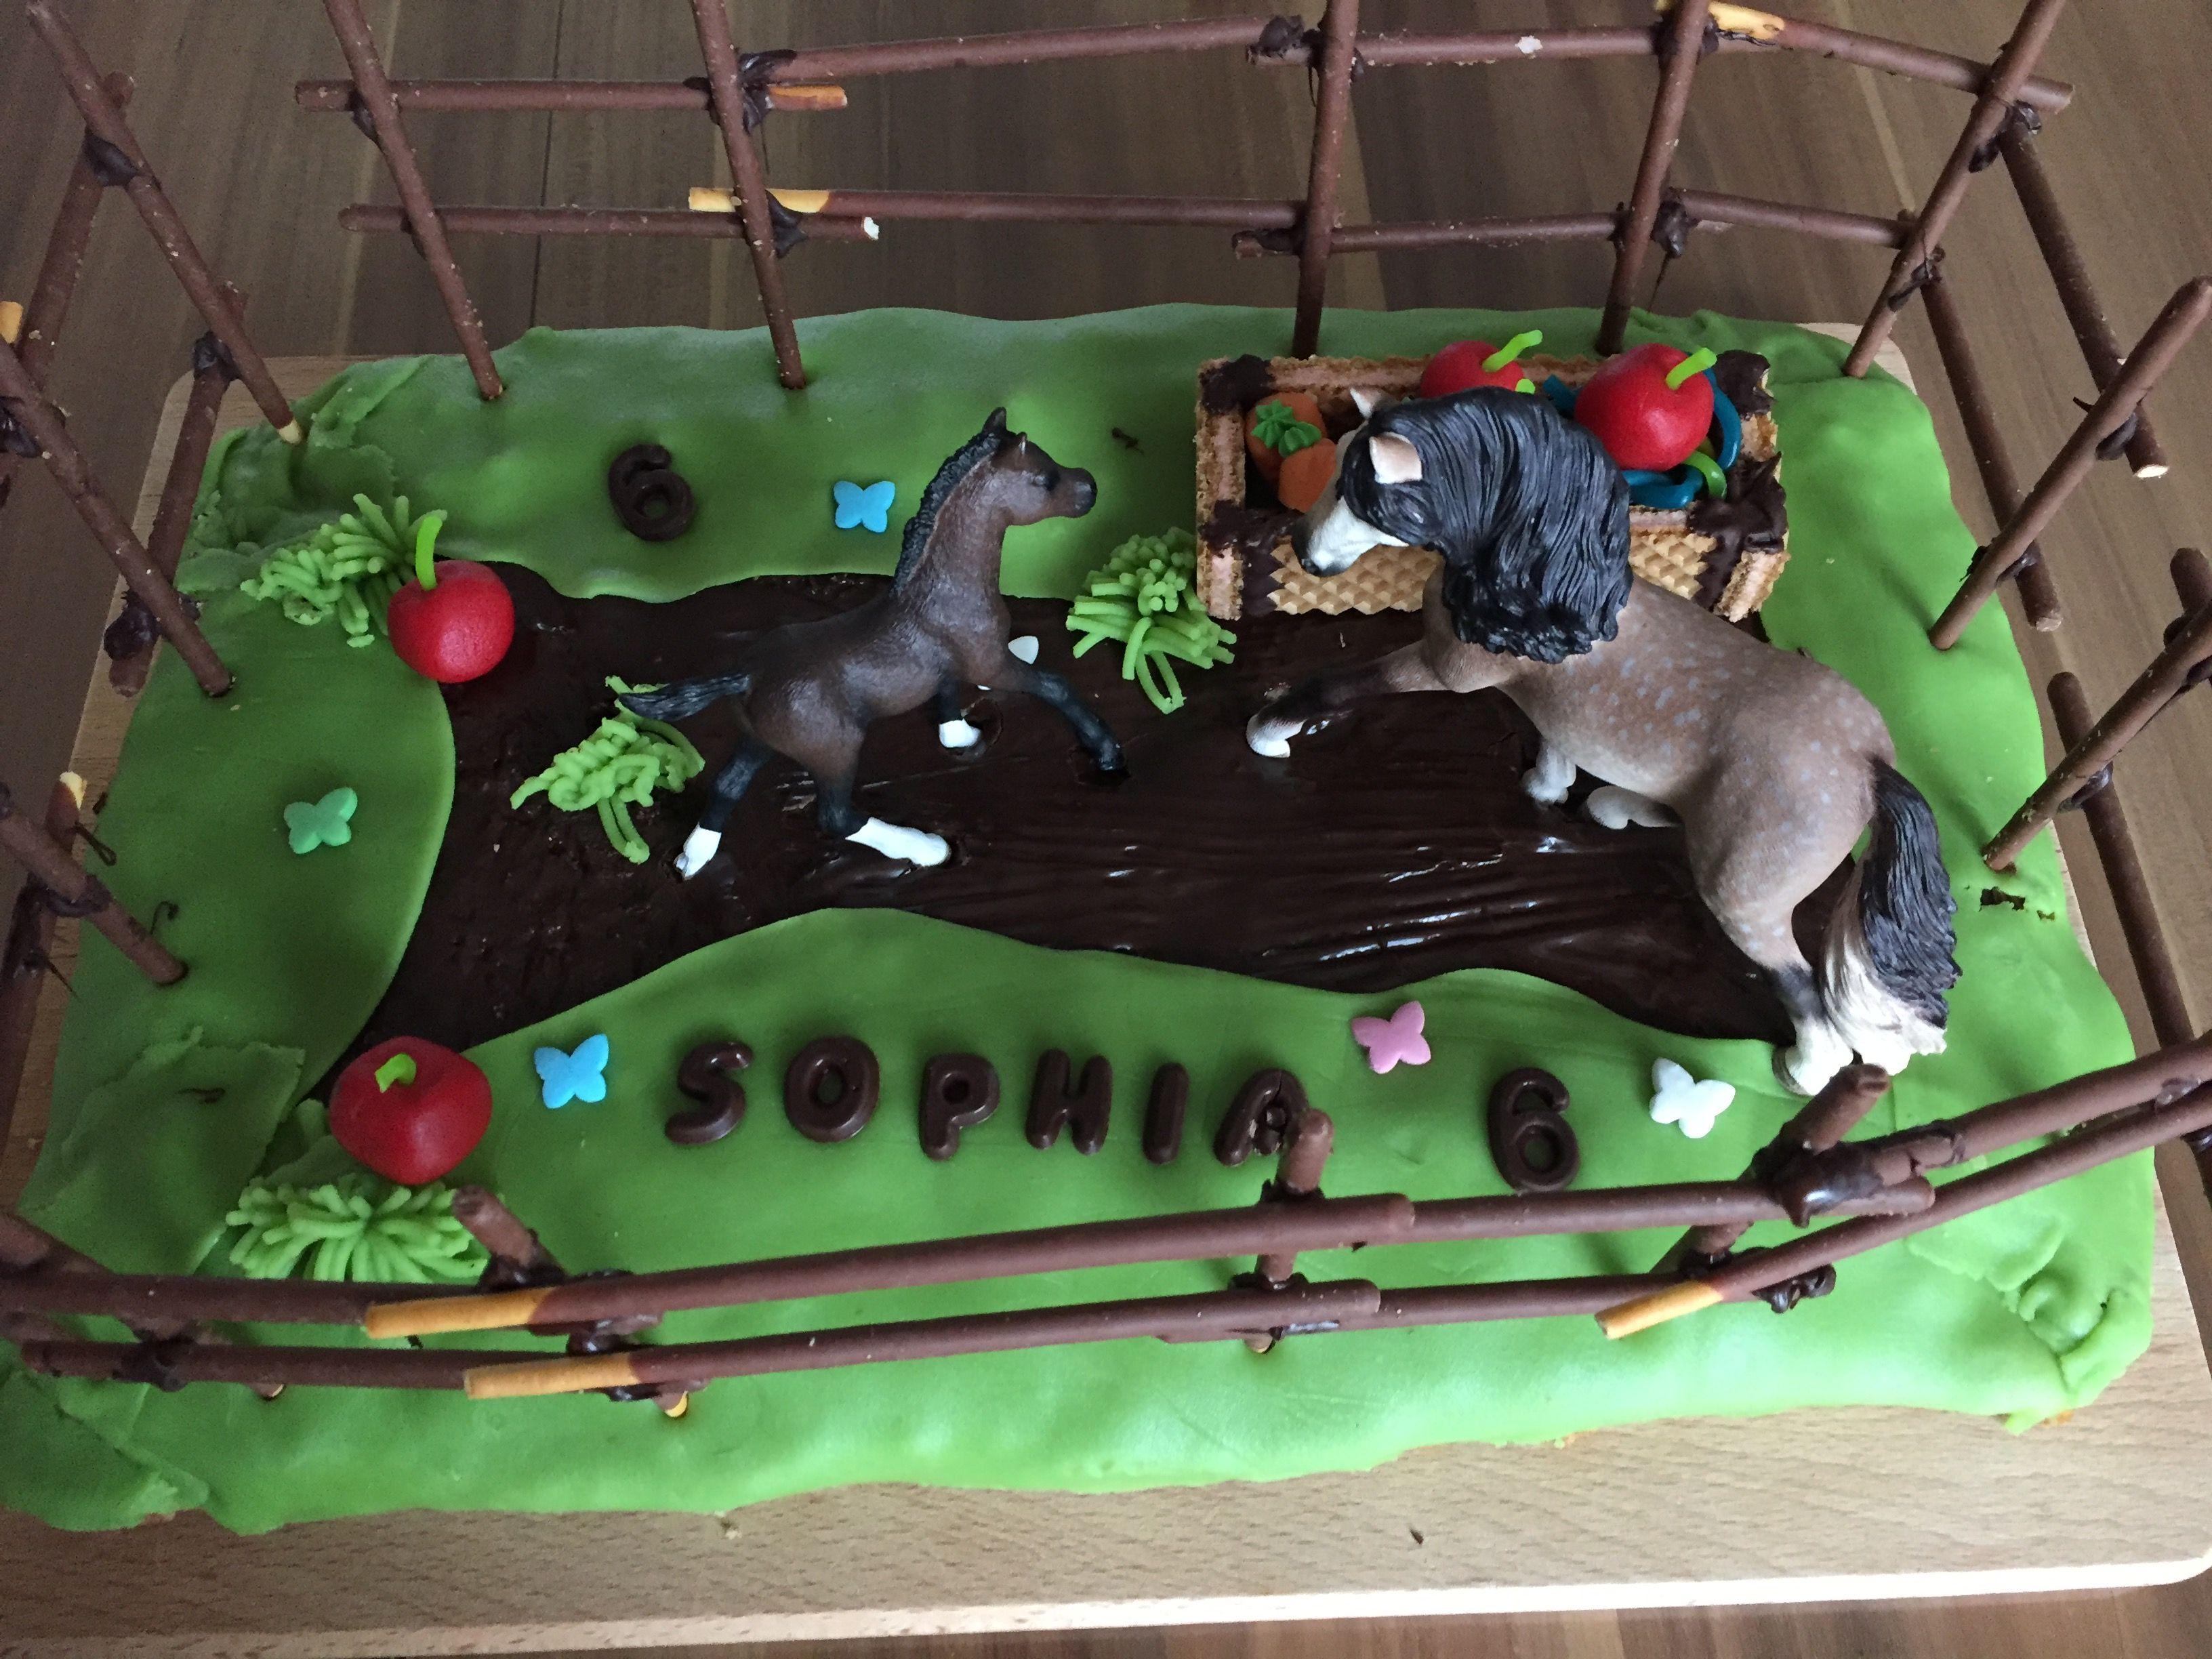 Pferdekoppel Geburtstagskuchen Rezept Geburtstagskuchen Pferd Torte Pferde Kuchen